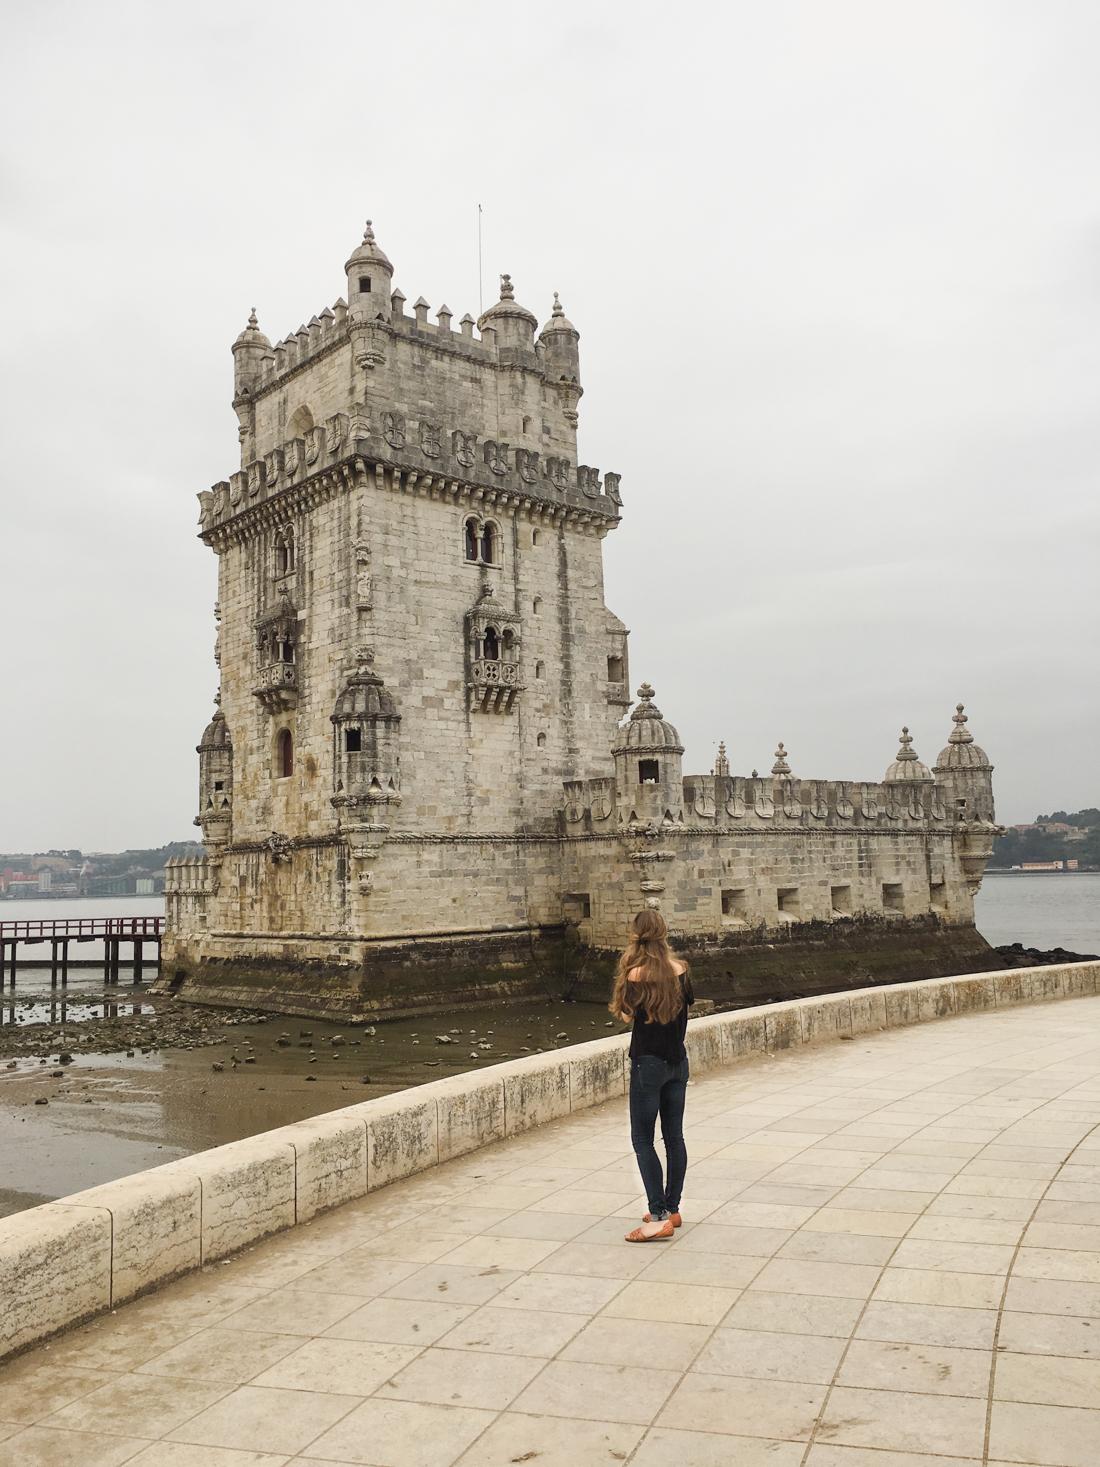 Belem Tower. Lisbon Travel Guide